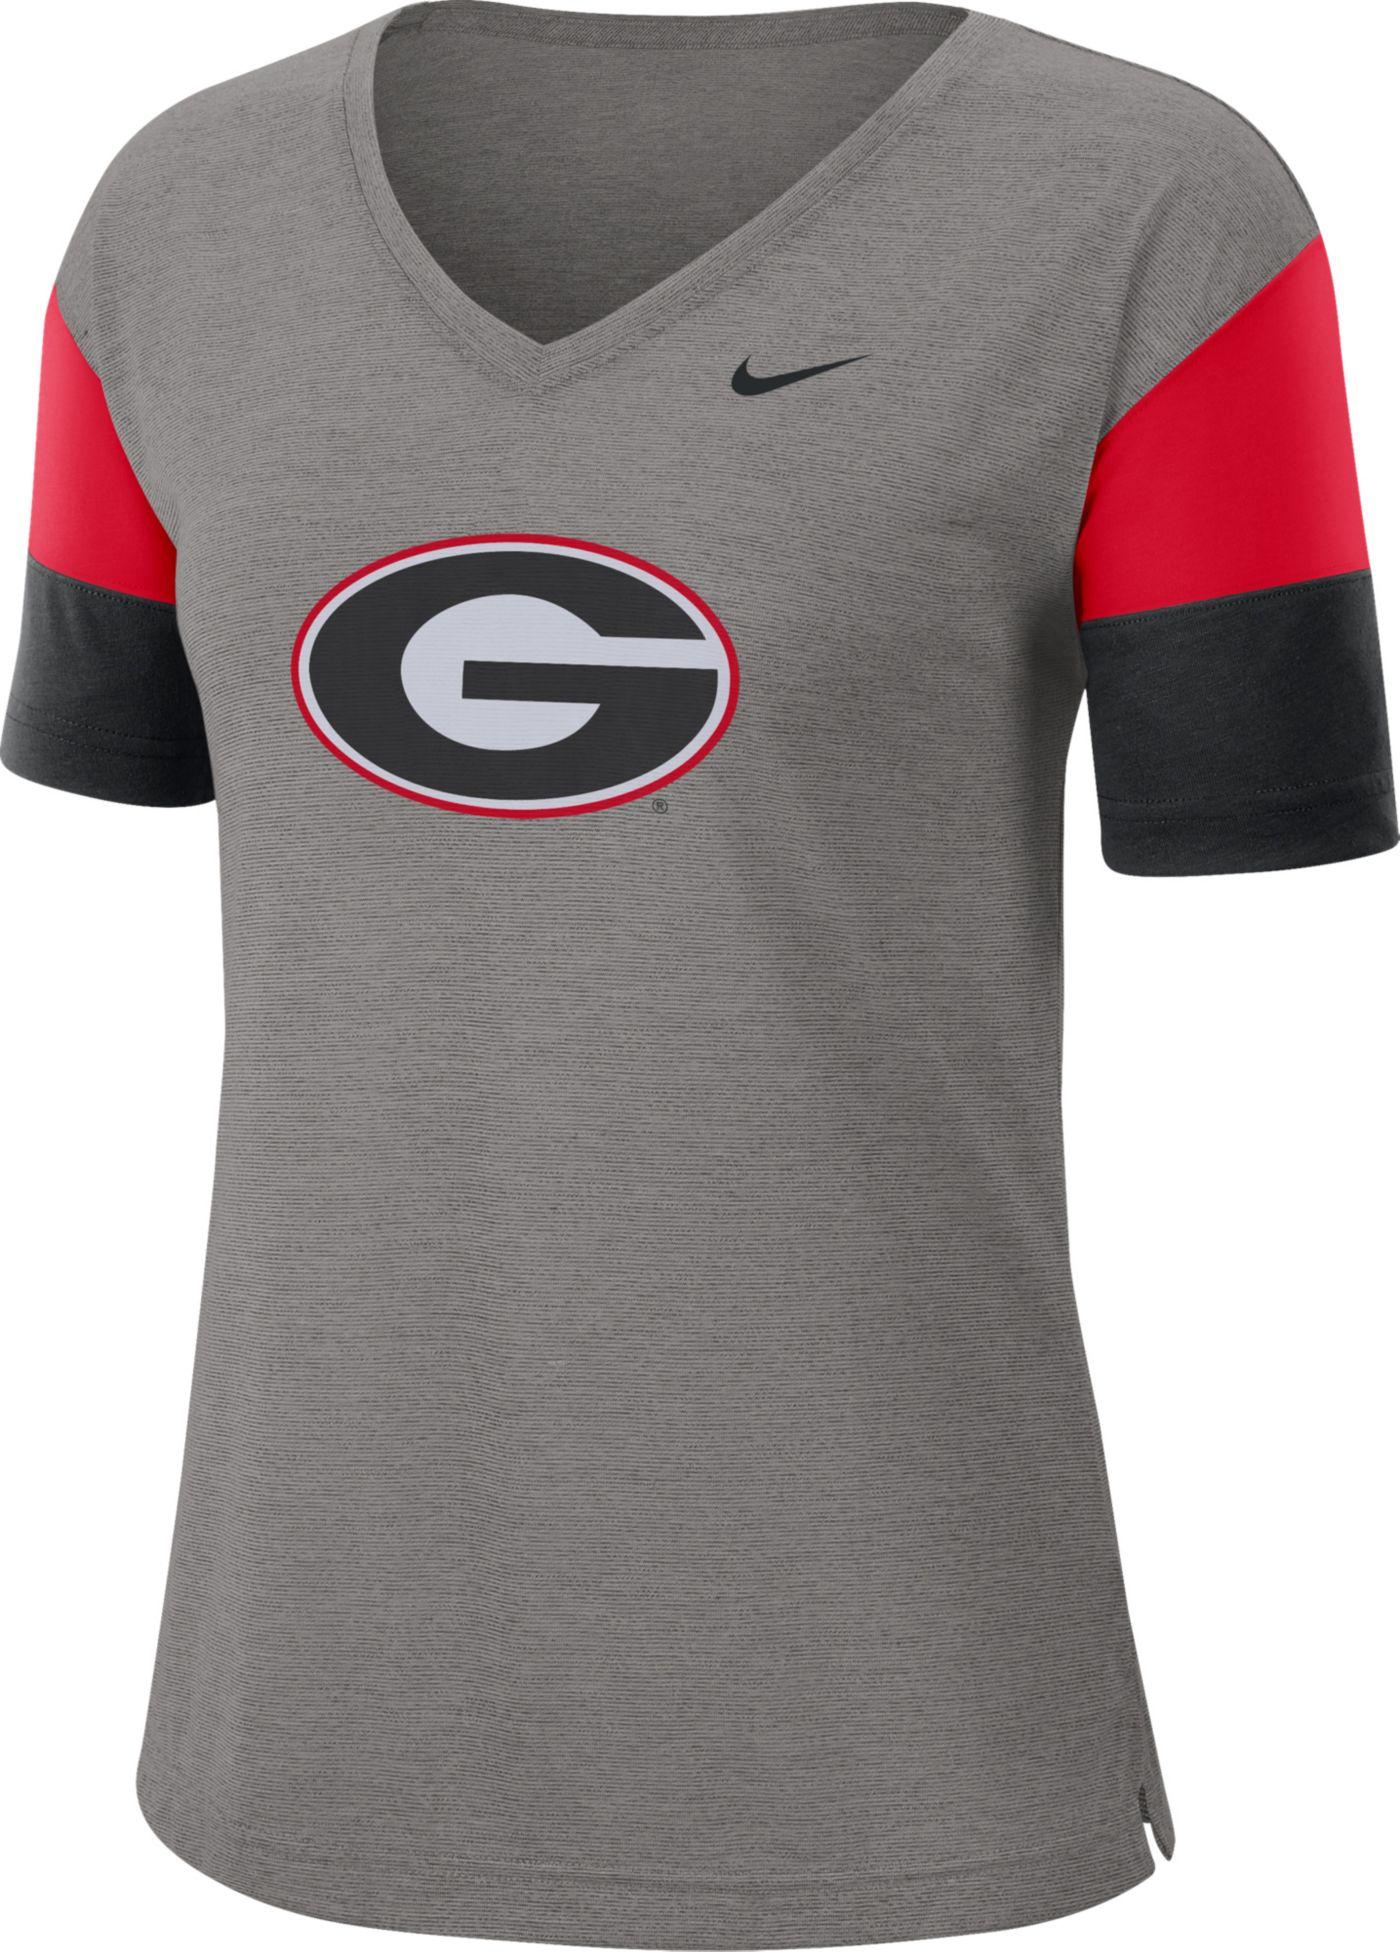 Nike Women's Georgia Bulldogs Grey Breathe V-Neck T-Shirt